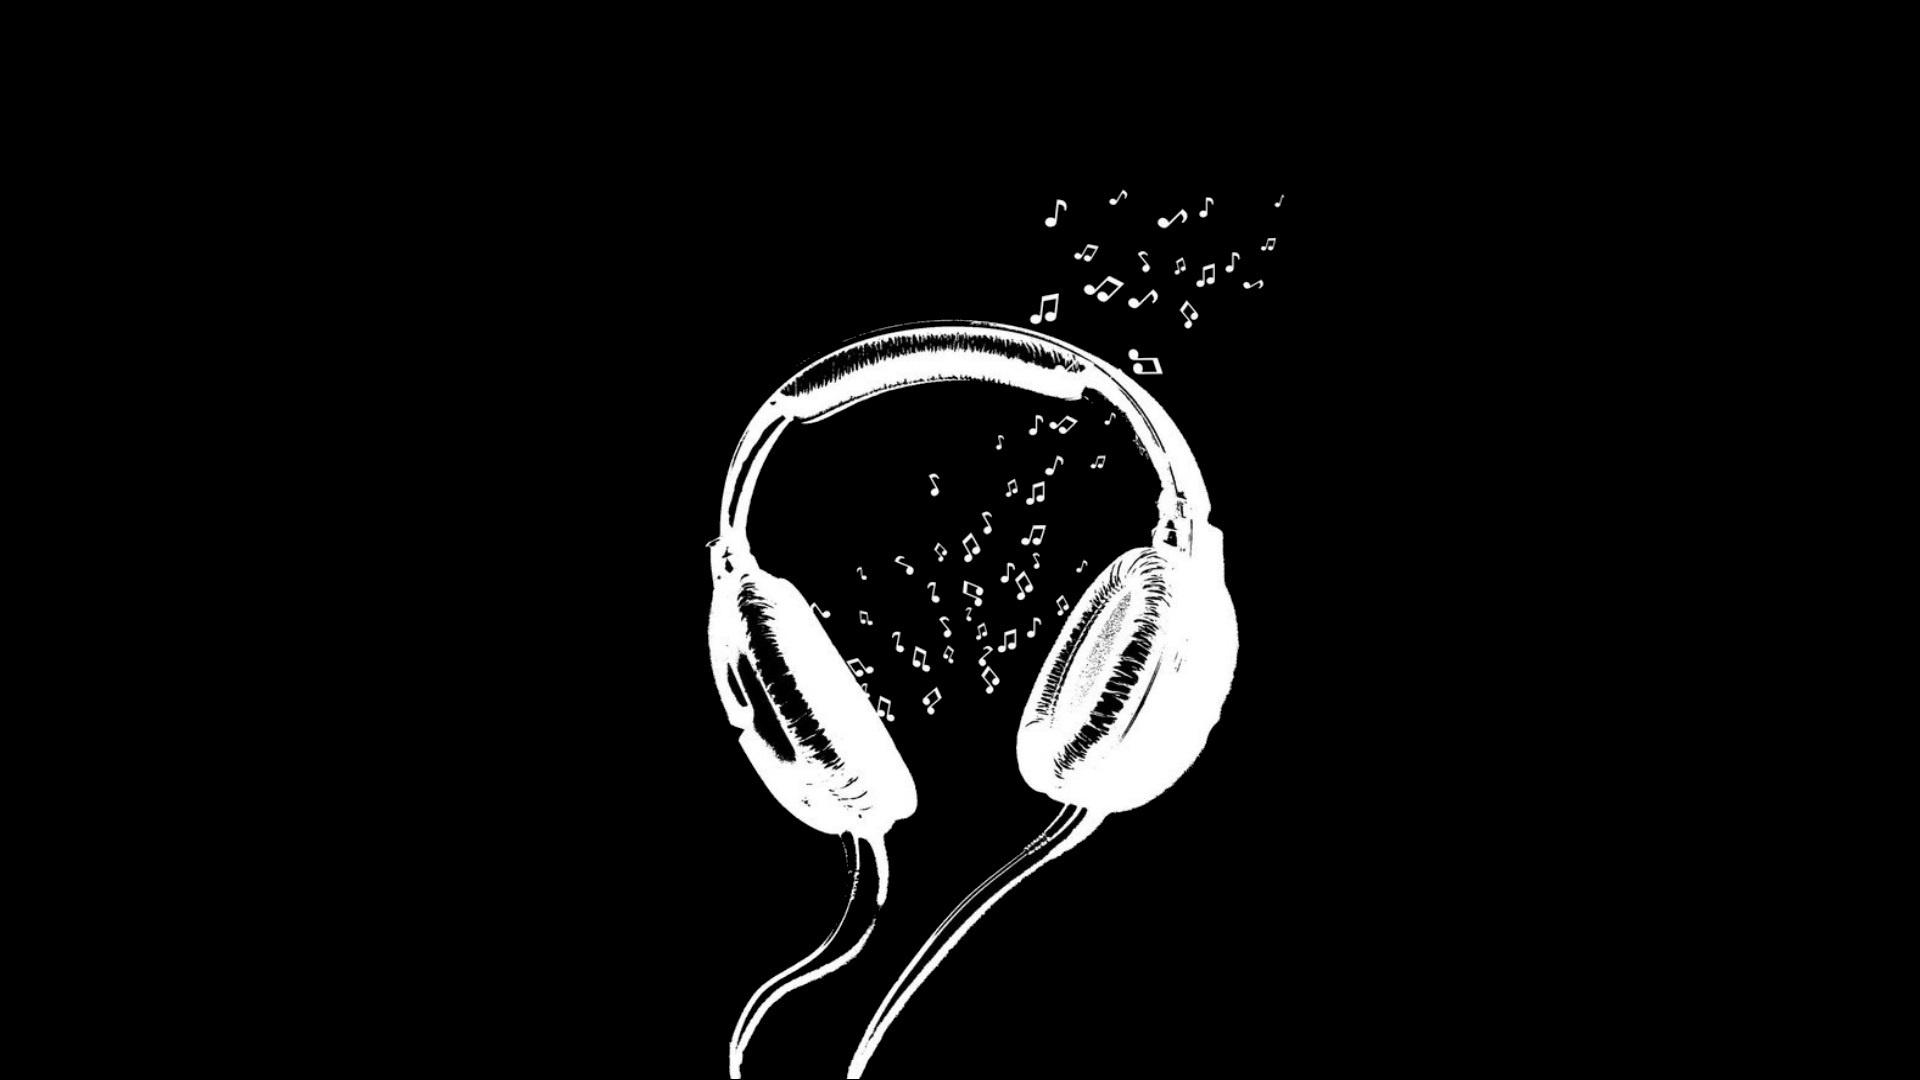 Музыка картинки черные